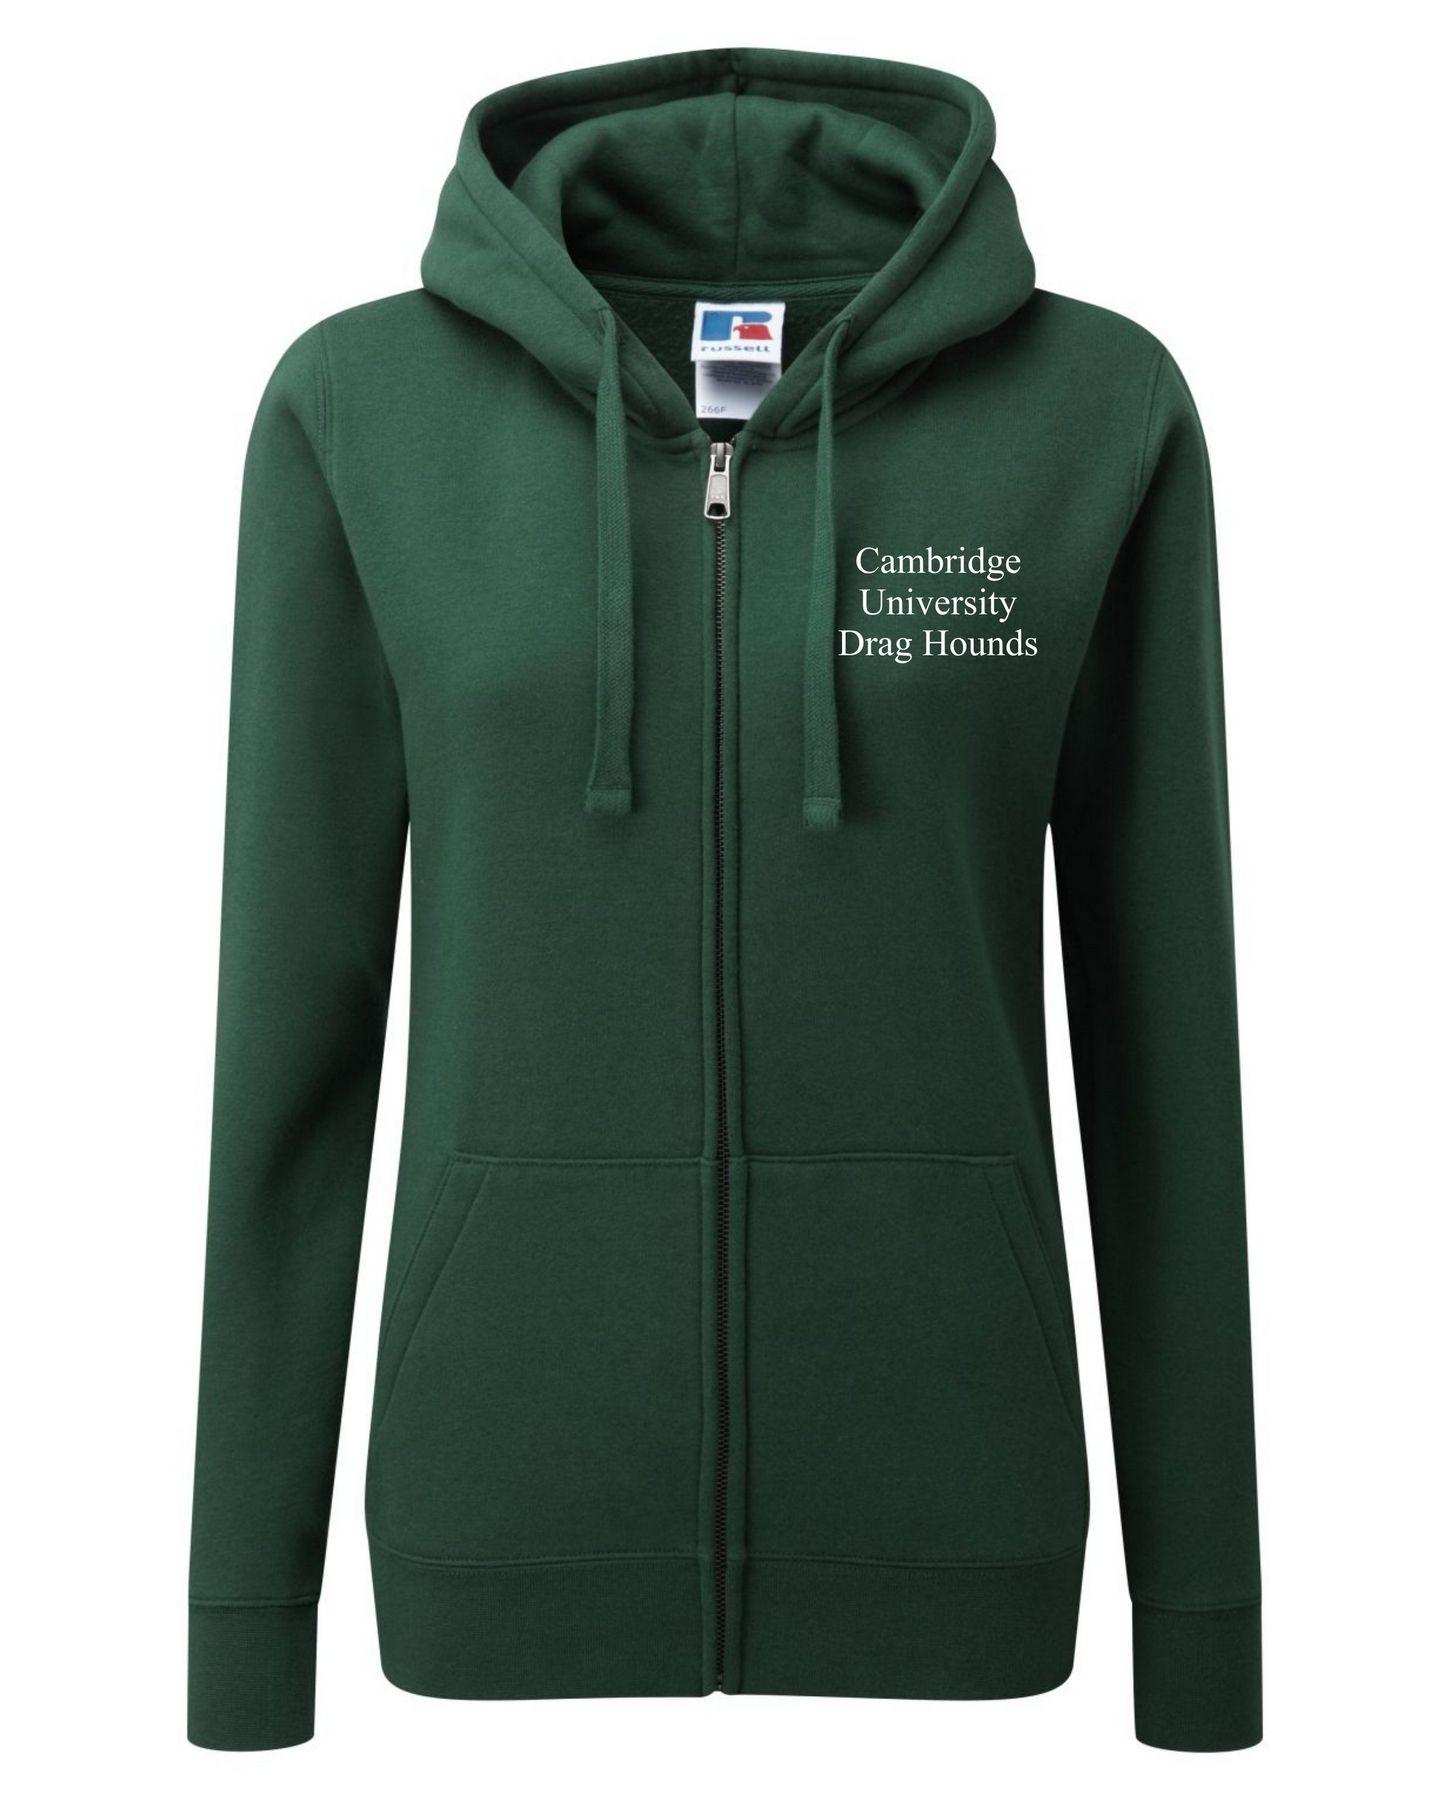 CUDH – Women's Premium Authentic Zipped Hoodie